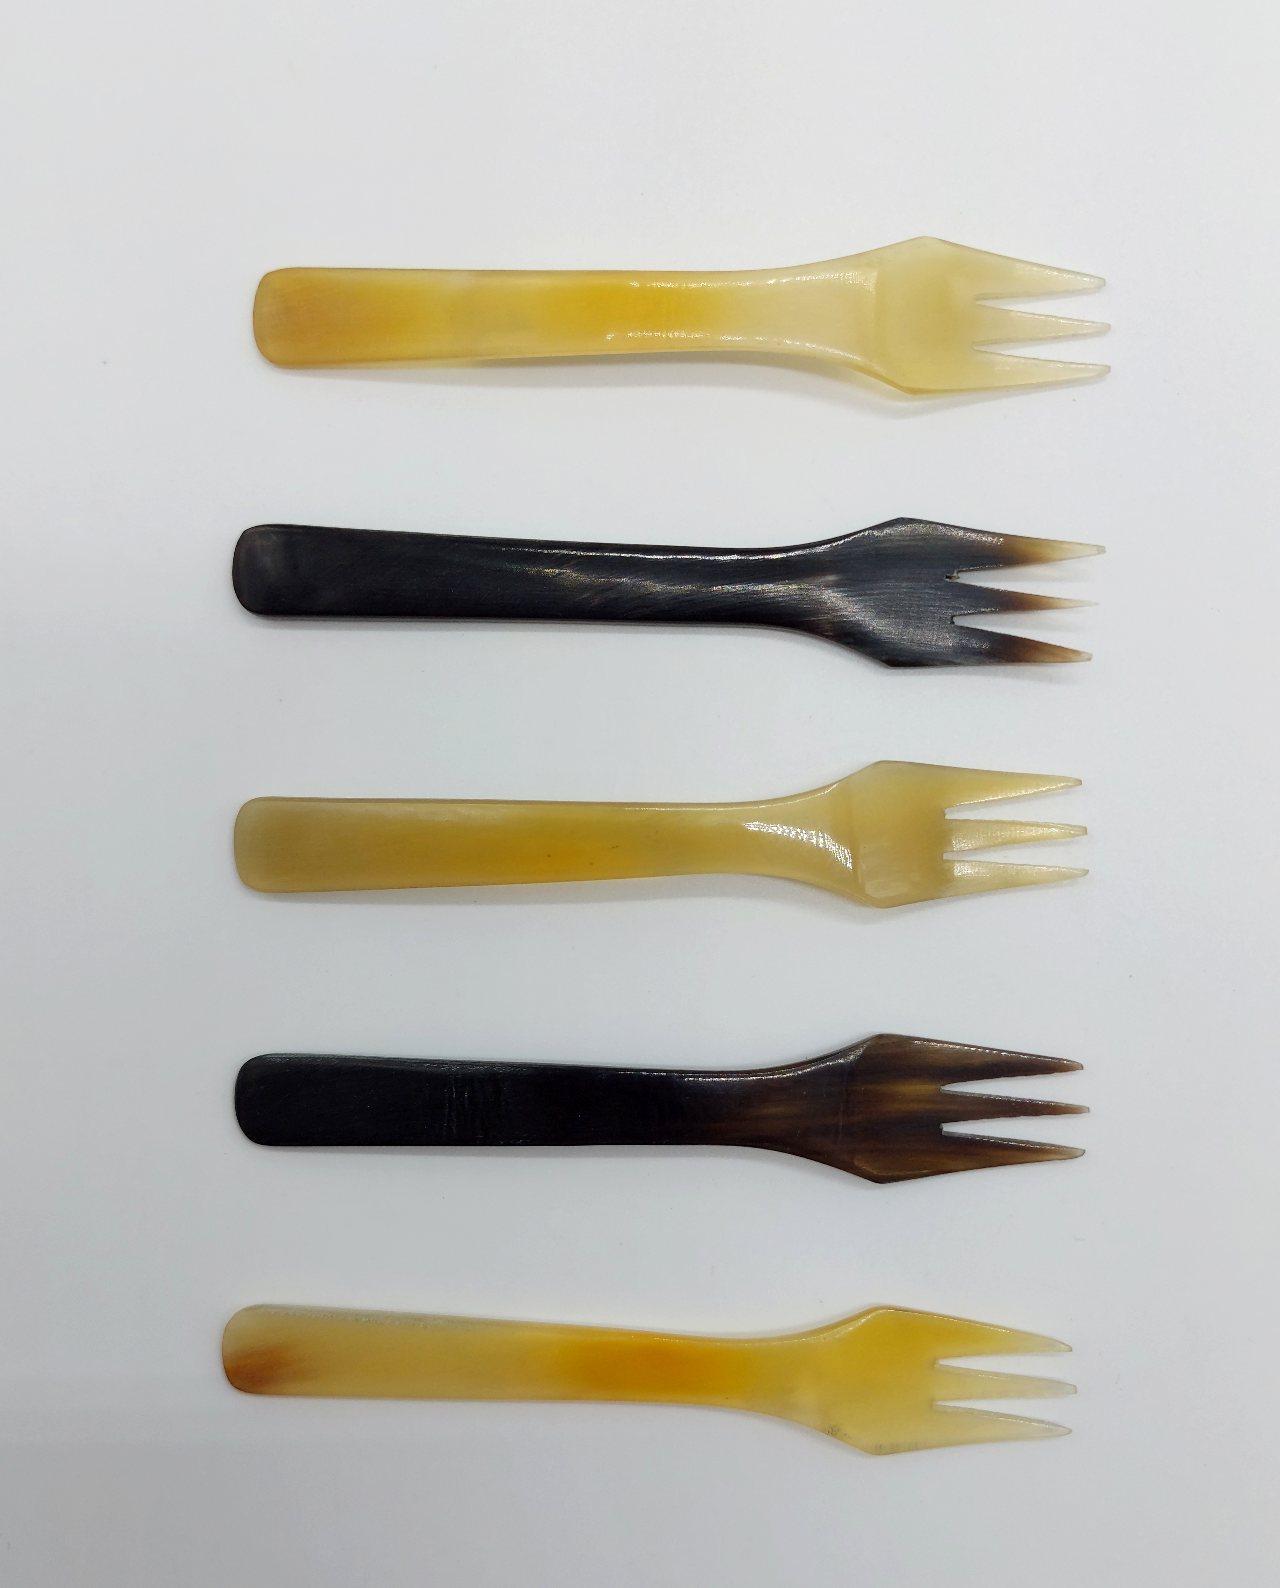 Forks Bone Set 5 pieces Length 12 cm